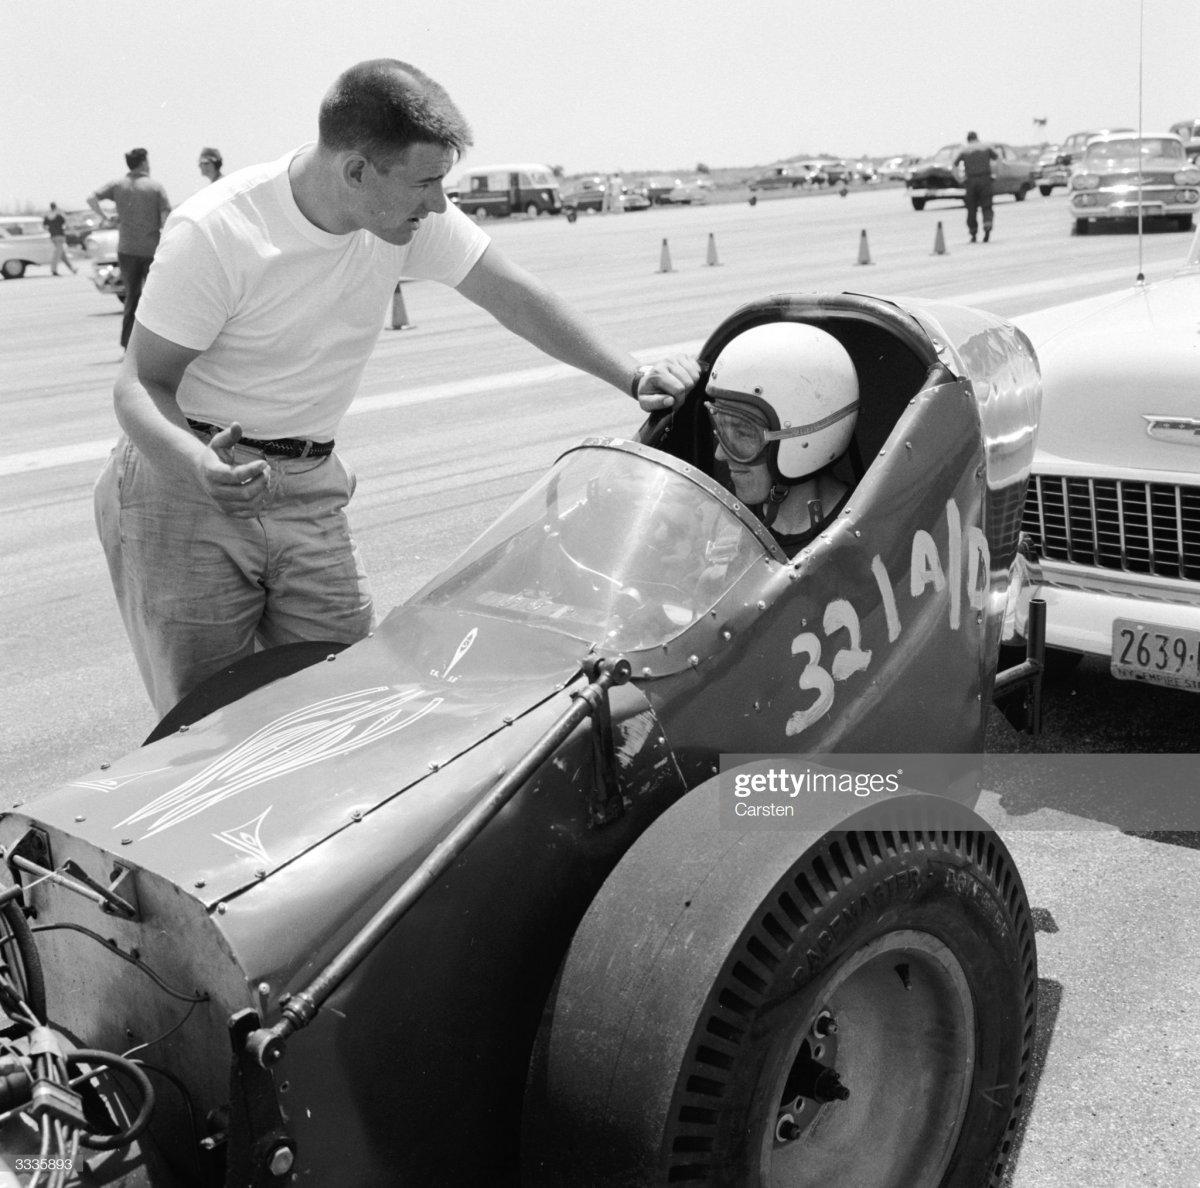 83 1959 Driver Jack Suther.jpg